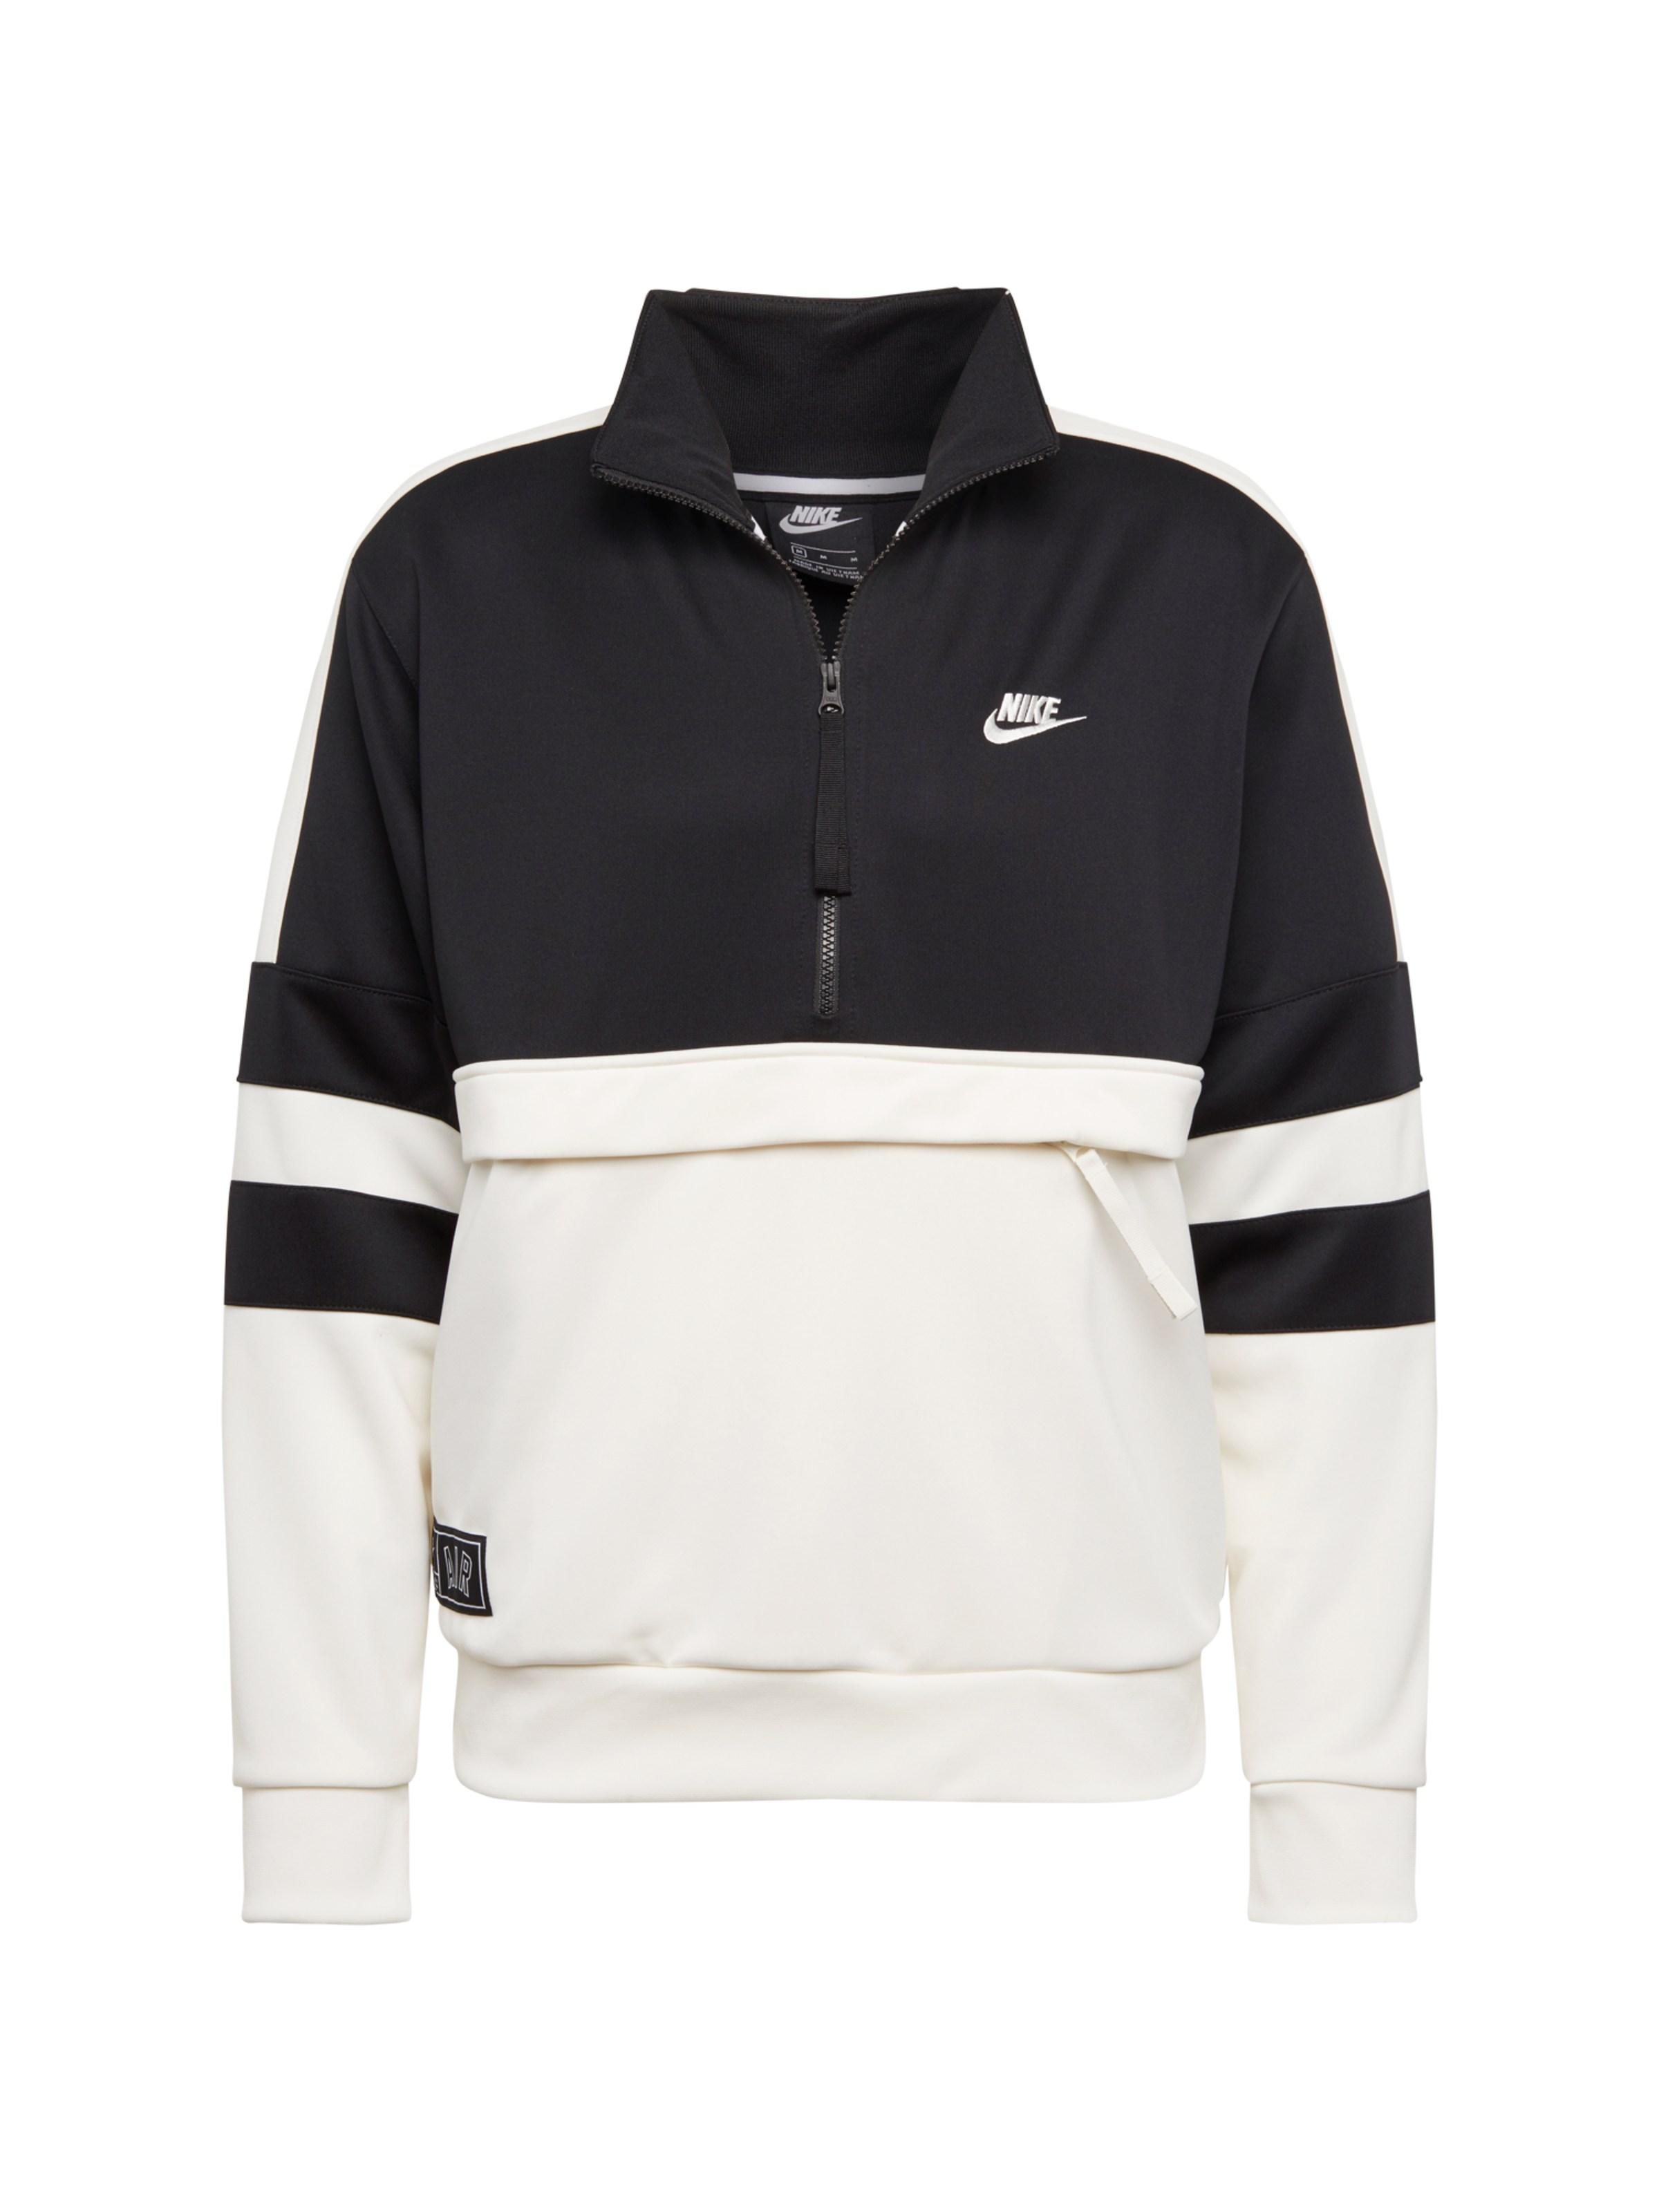 92d0a9ee9b1 Nike Sportswear Mikina černá   bílá - Glami.cz